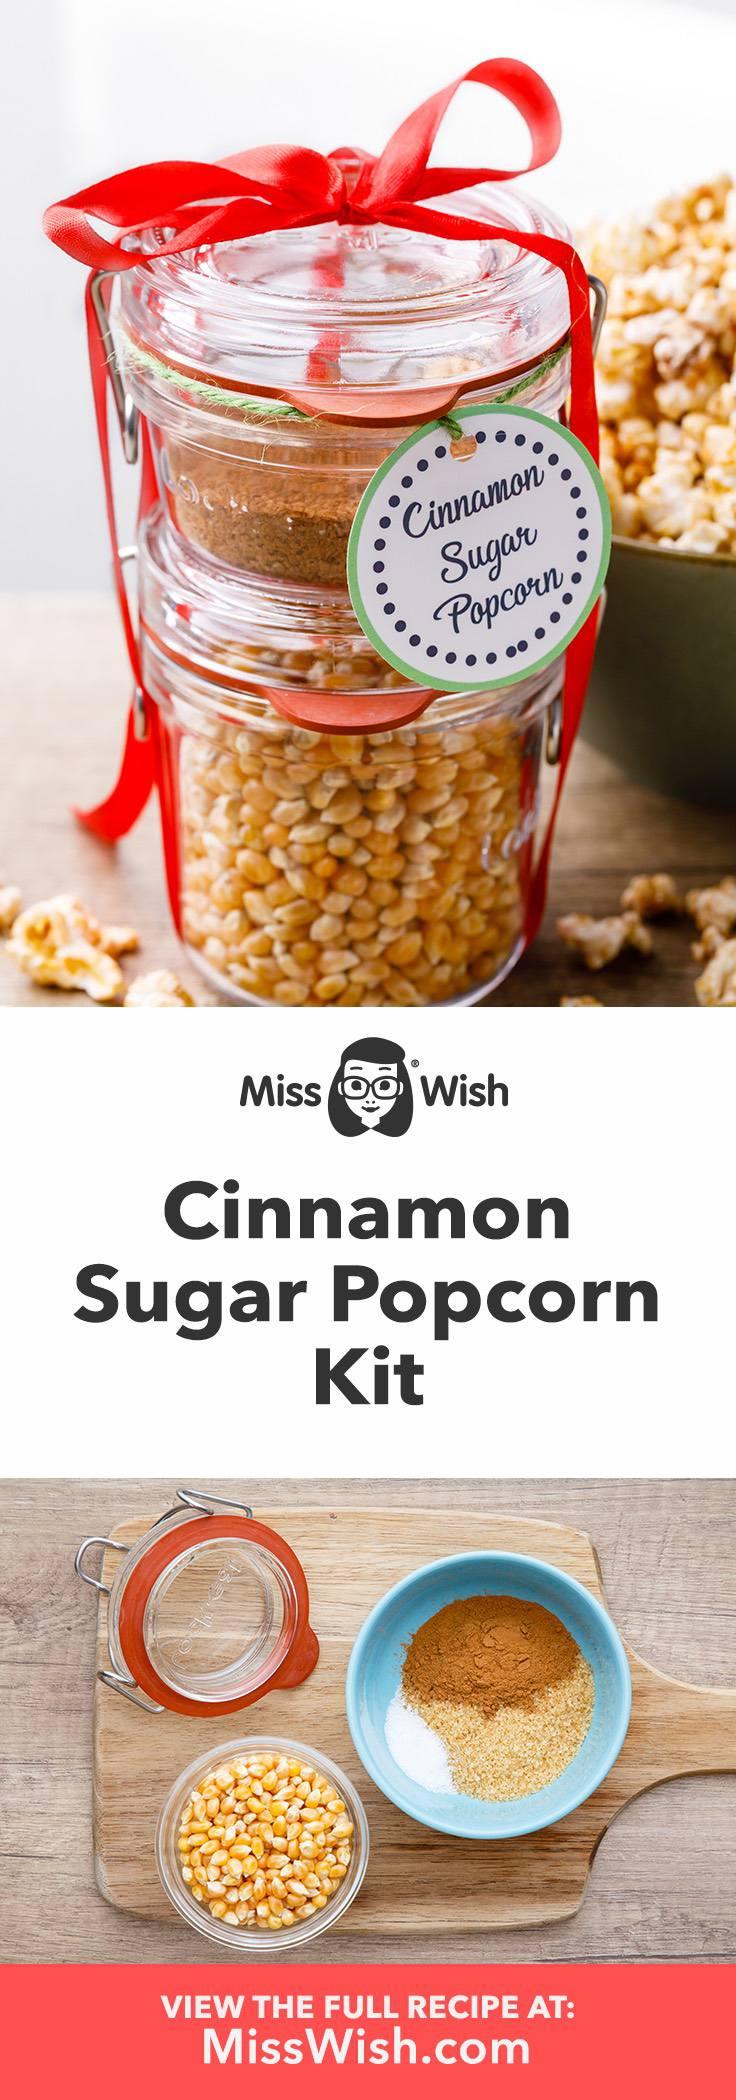 Easy diy cinnamon sugar popcorn gift kit.